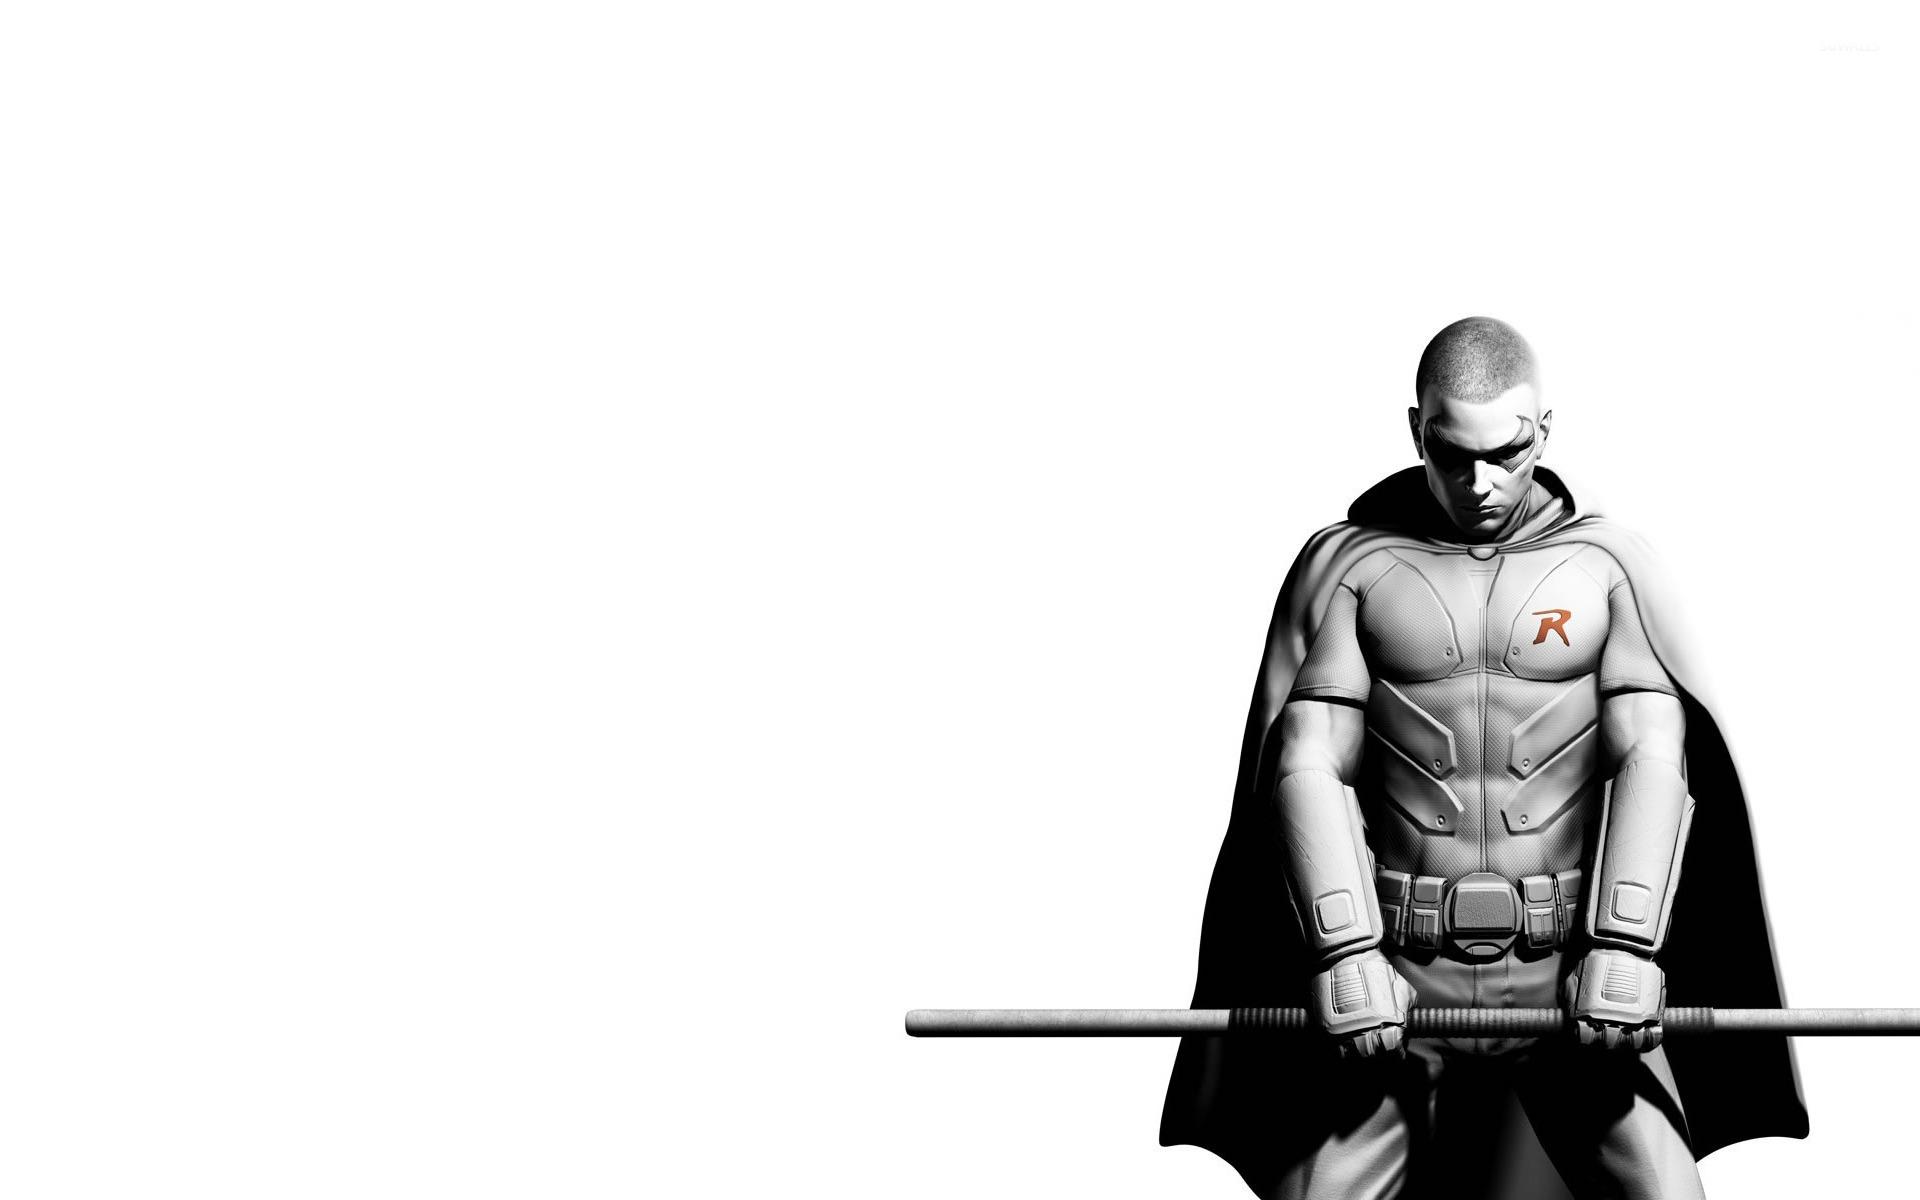 robin - batman: arkham city wallpaper - game wallpapers - #15806